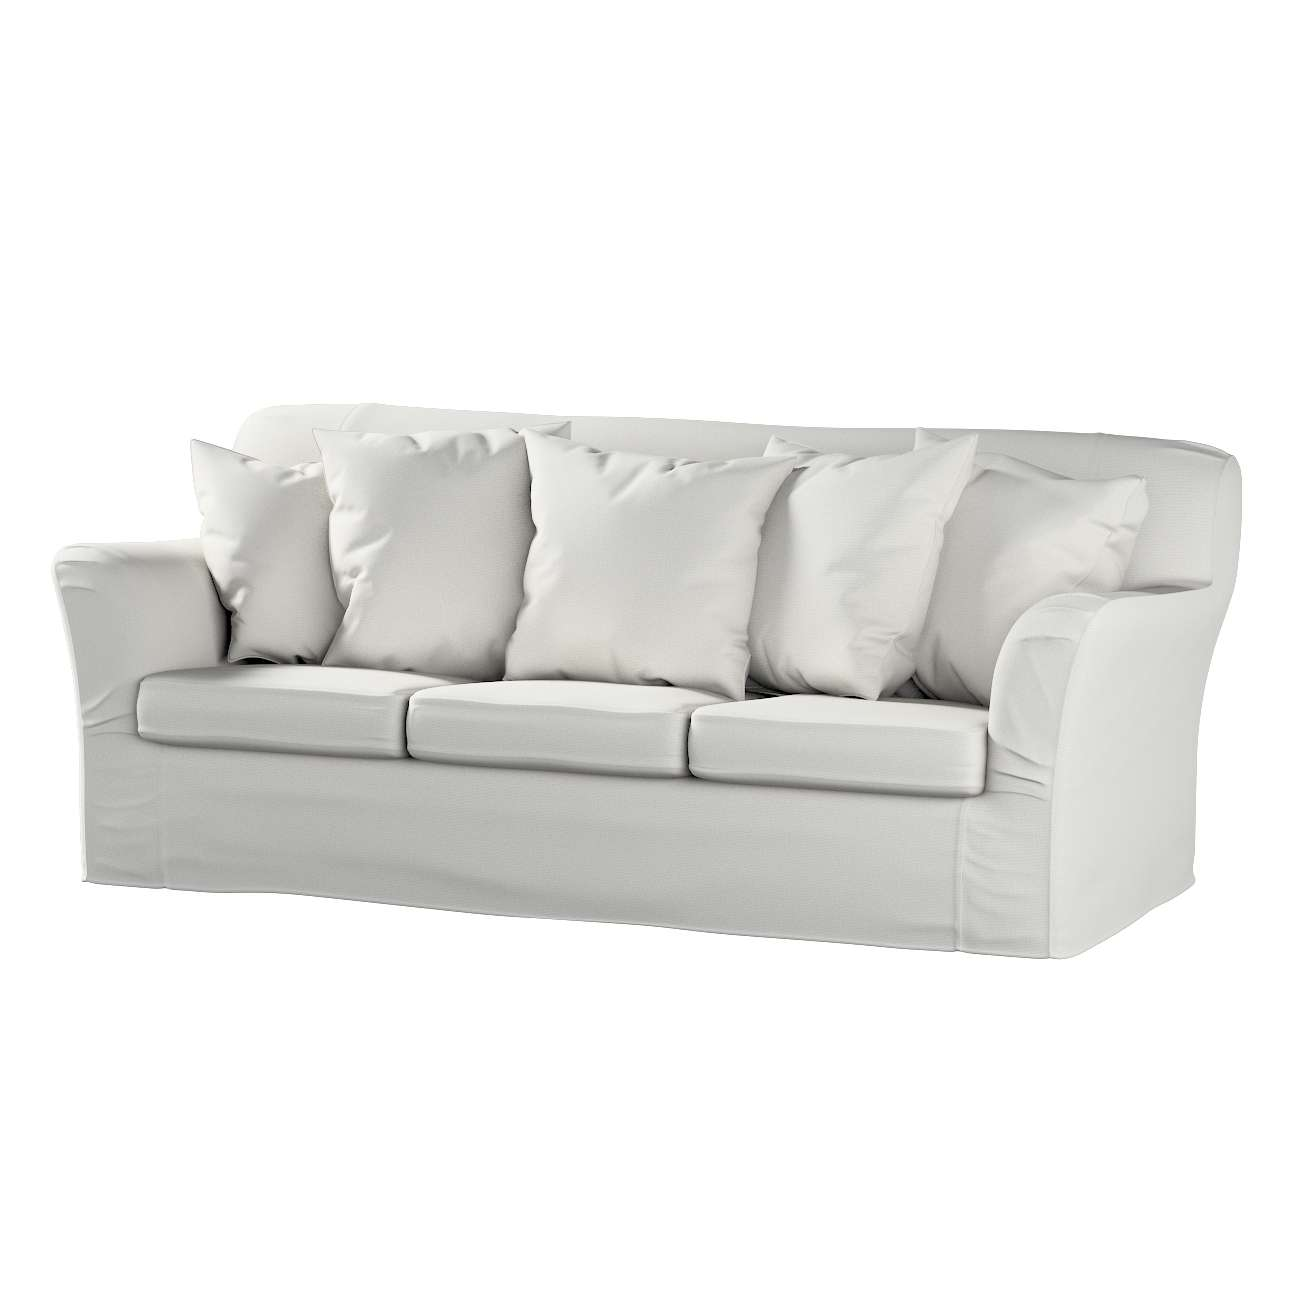 TOMELILLA  trivietės sofos užvalkalas TOMELILLA trivietė sofa kolekcijoje Etna , audinys: 705-90